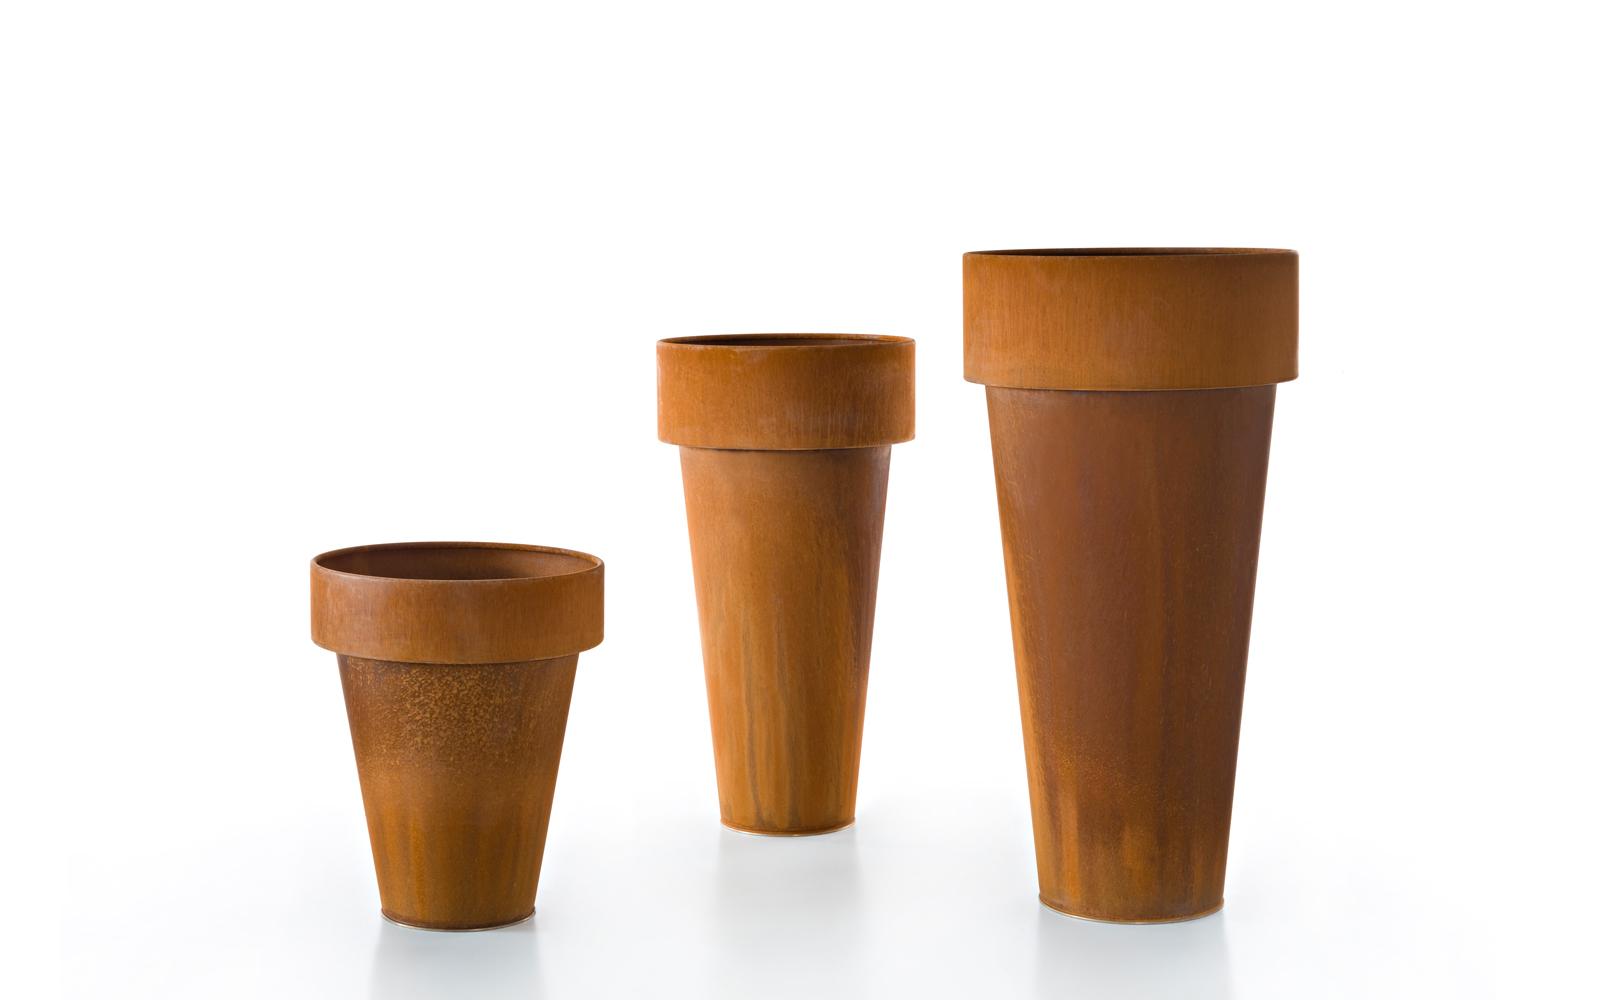 Hd home design omega acier corten pot de castelli for De castelli